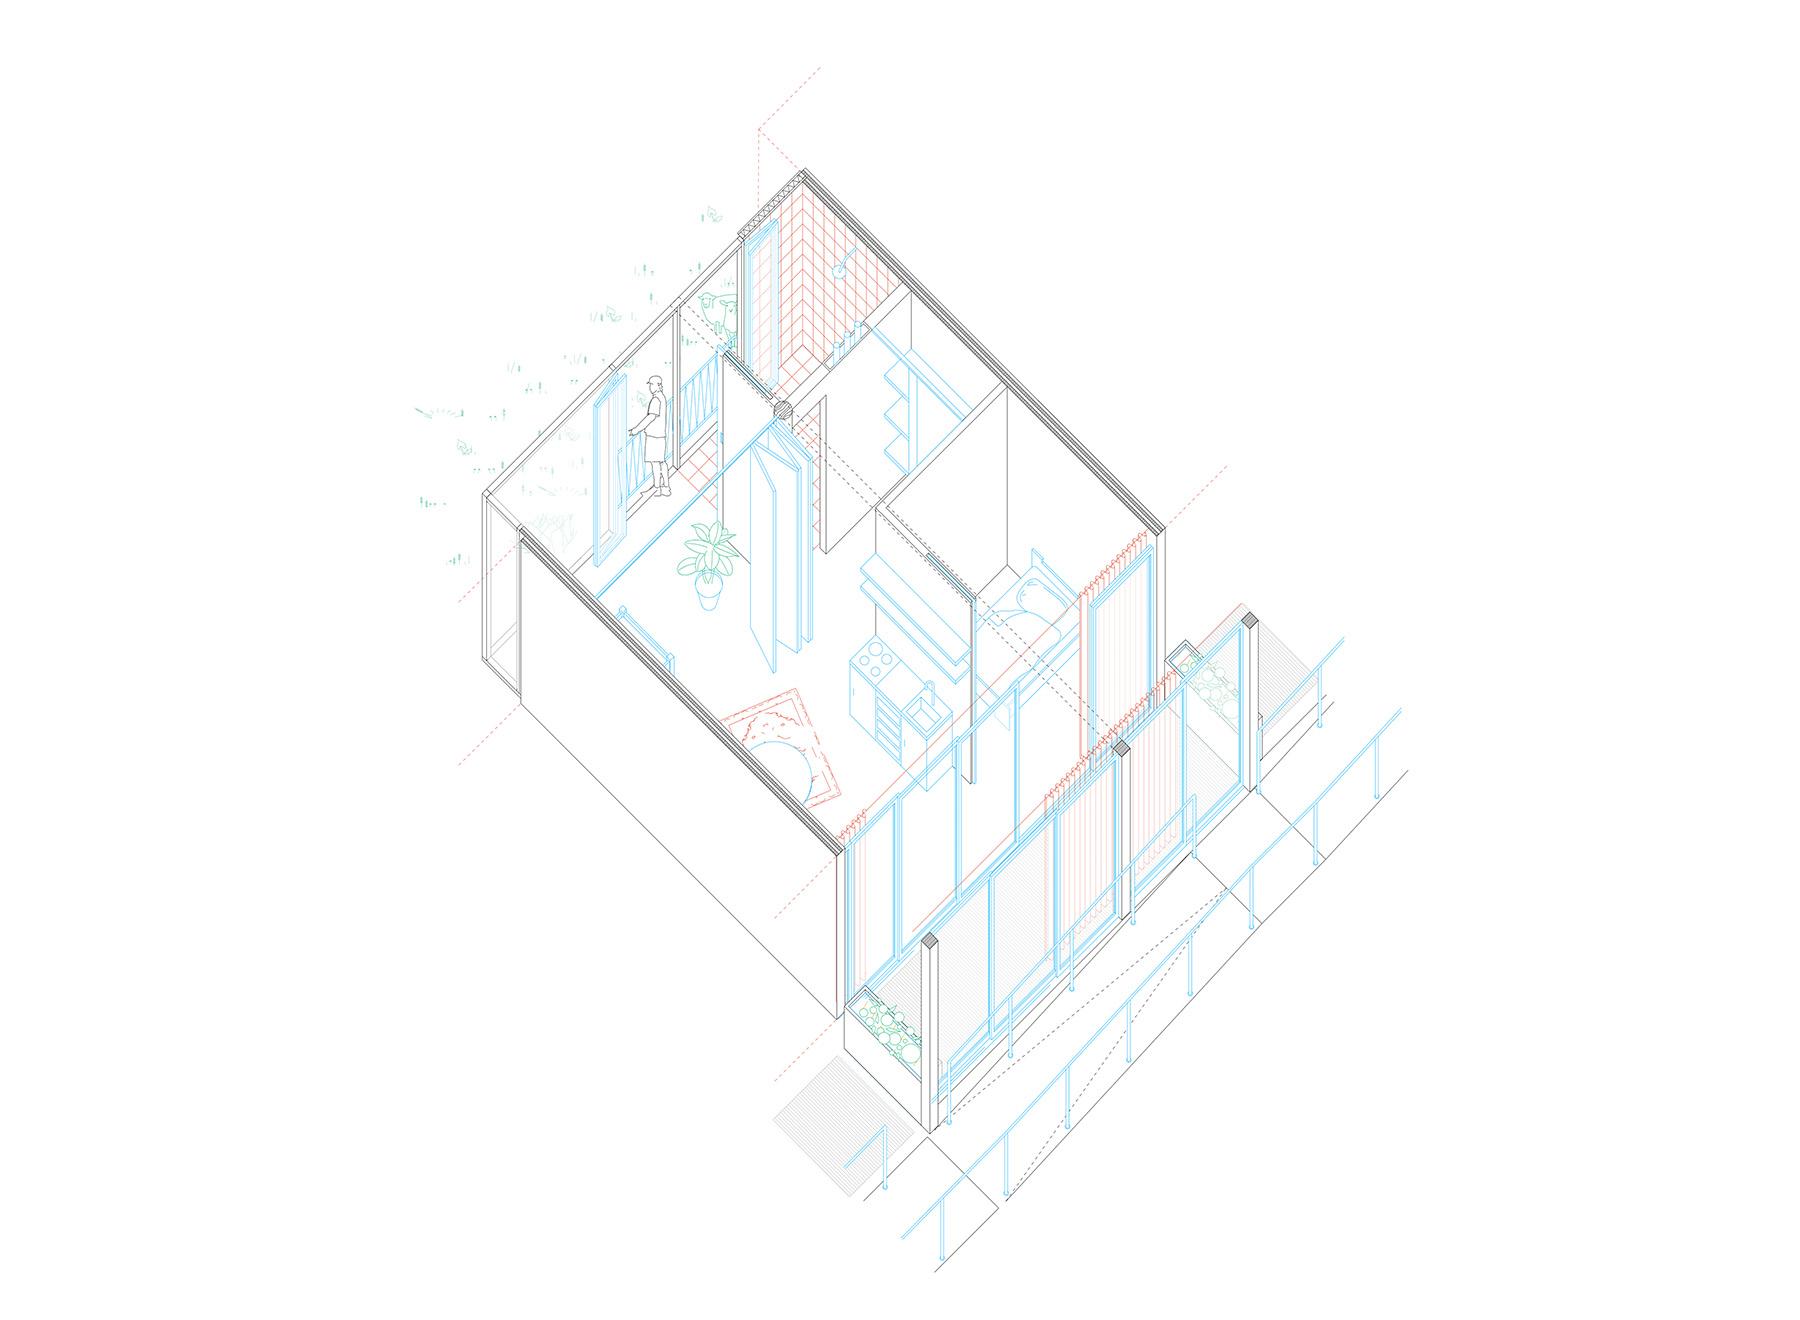 apartment, axonometric projection